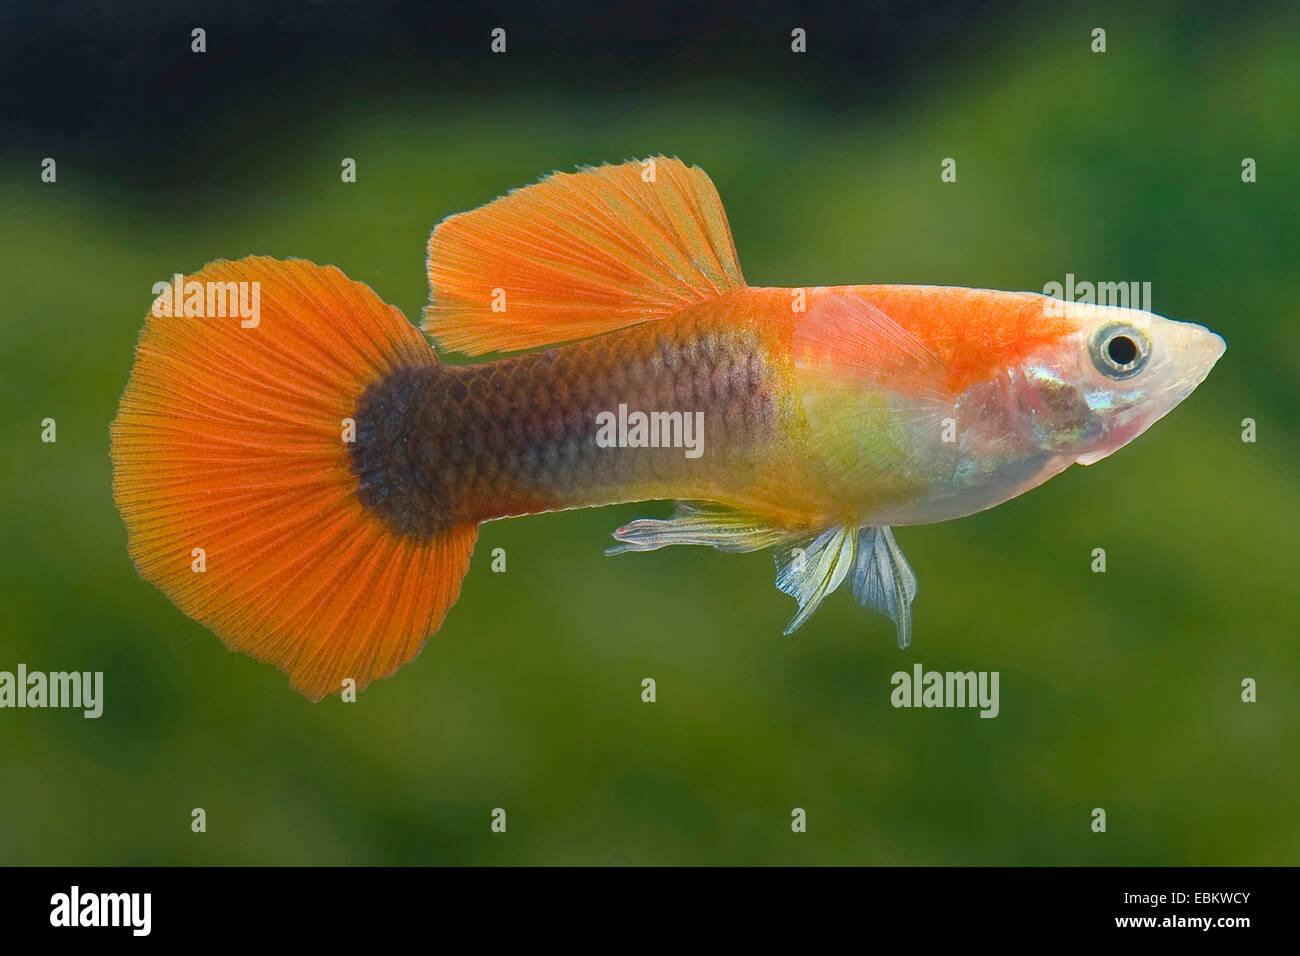 guppy (Poecilia reticulata, Lebistes reticulatus, Lebistes reticulata), breed form Tuxedo Blonde Red - Stock Image